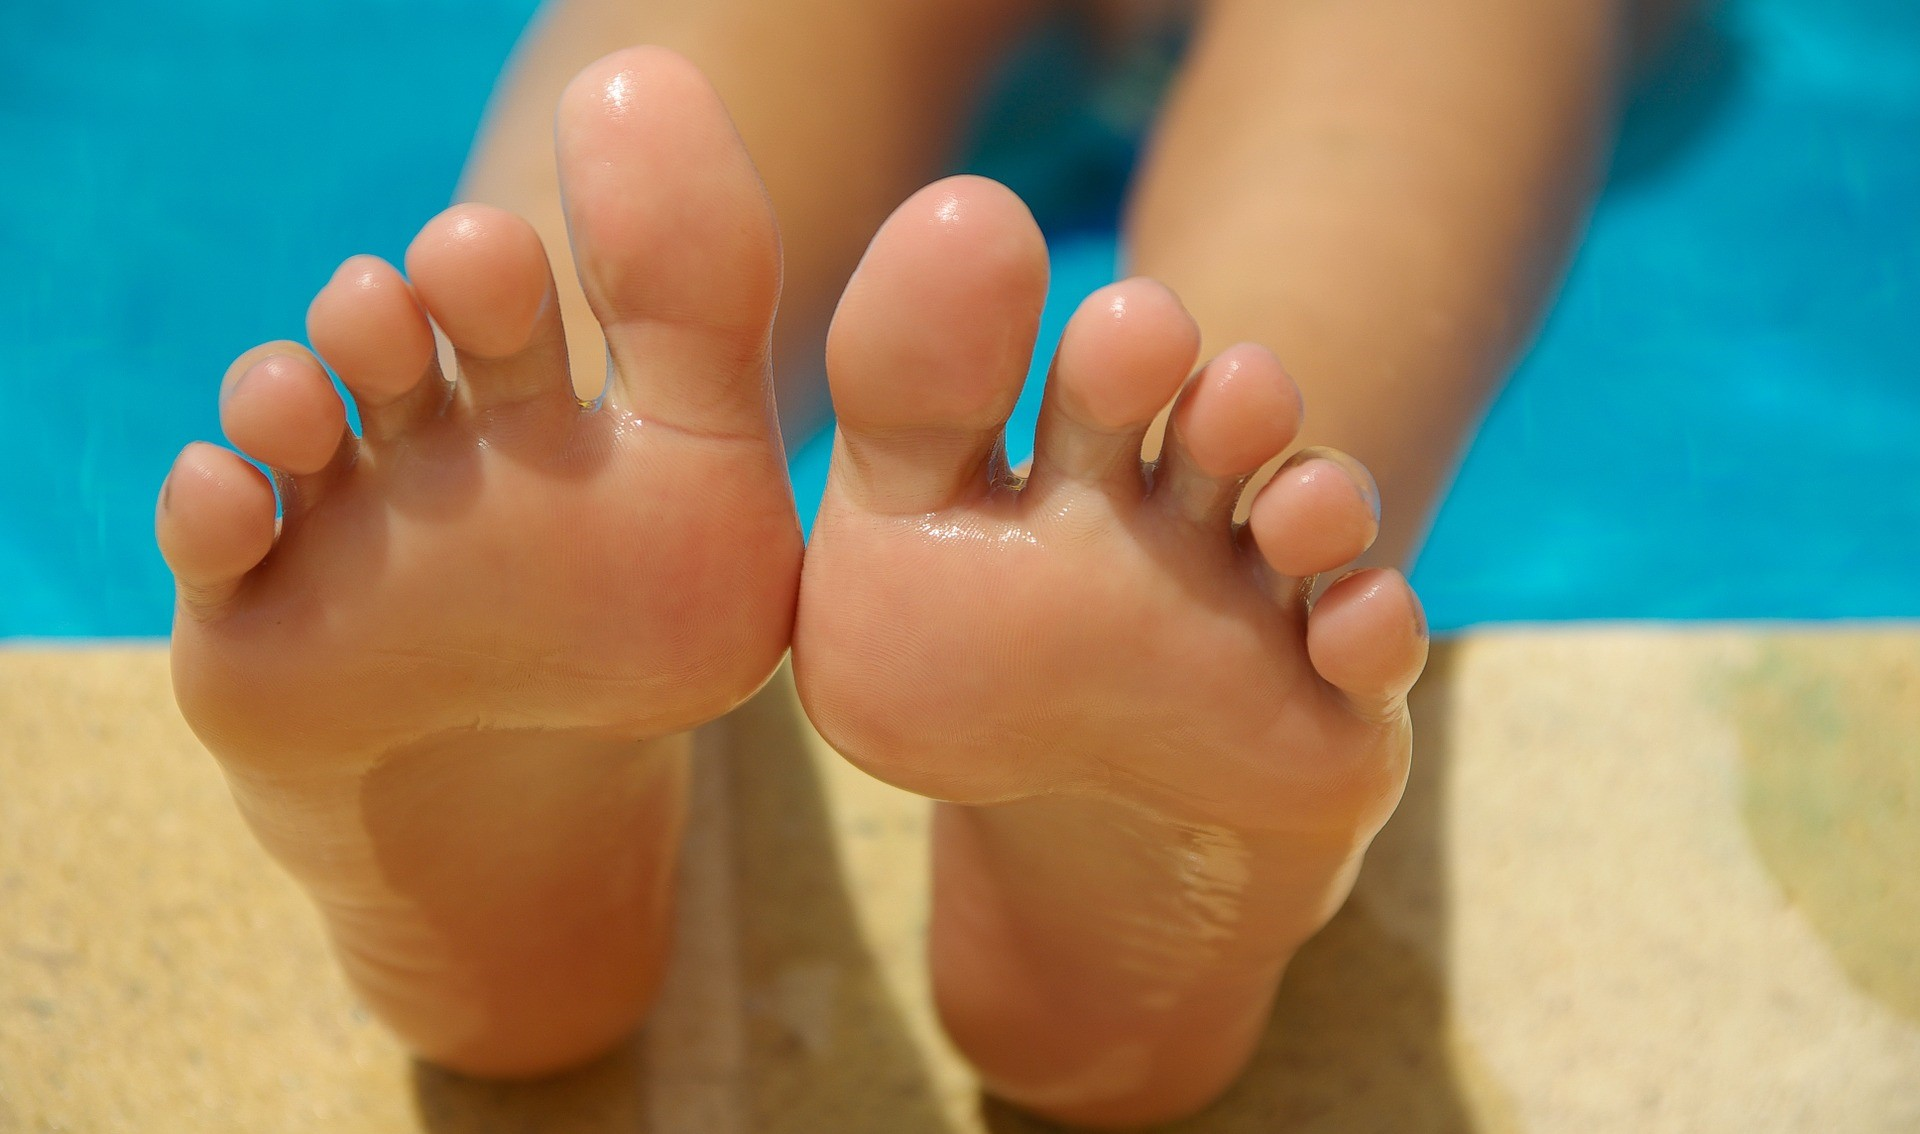 feet-830503_1920.jpg